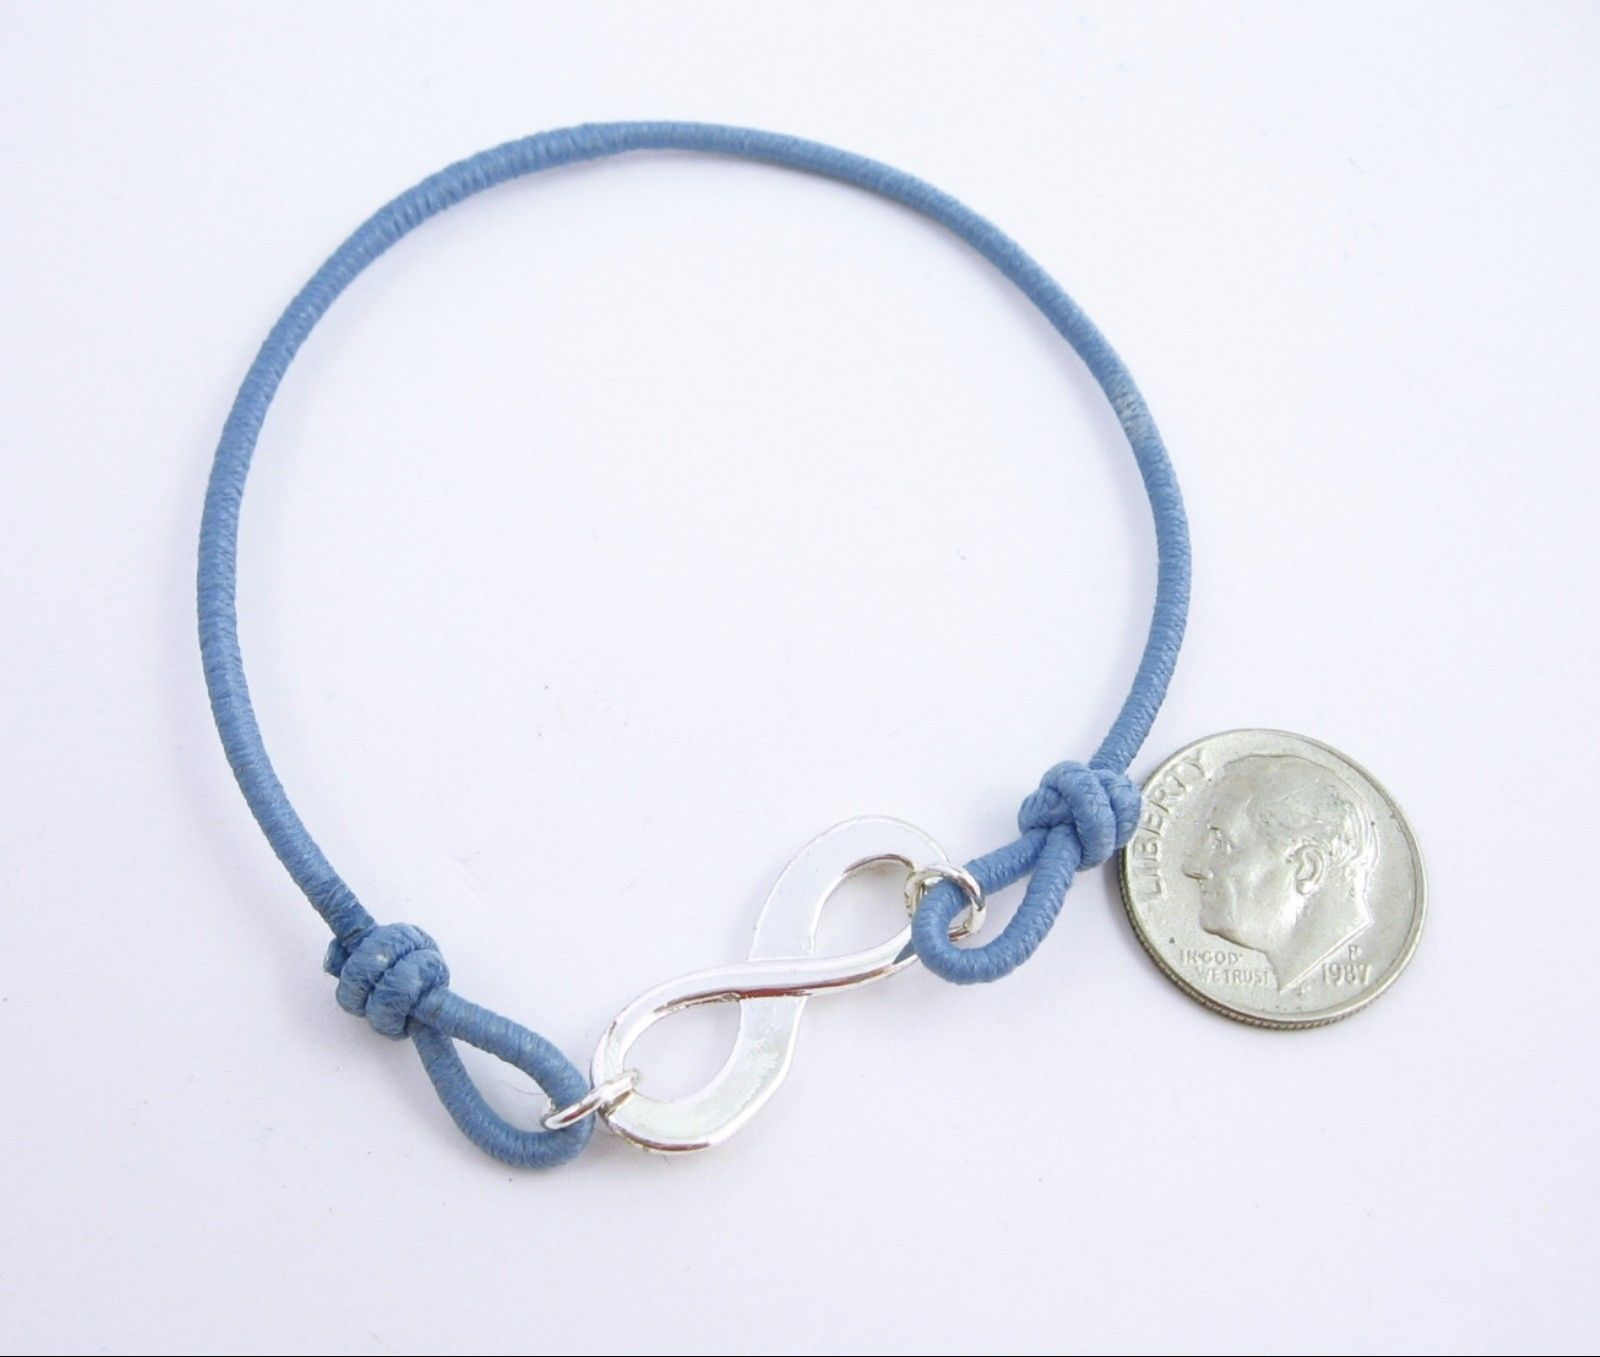 Avon EMPOWERMENT Blue BRACELET In BOX Silvertone INFINITY Charm Size Large NIB